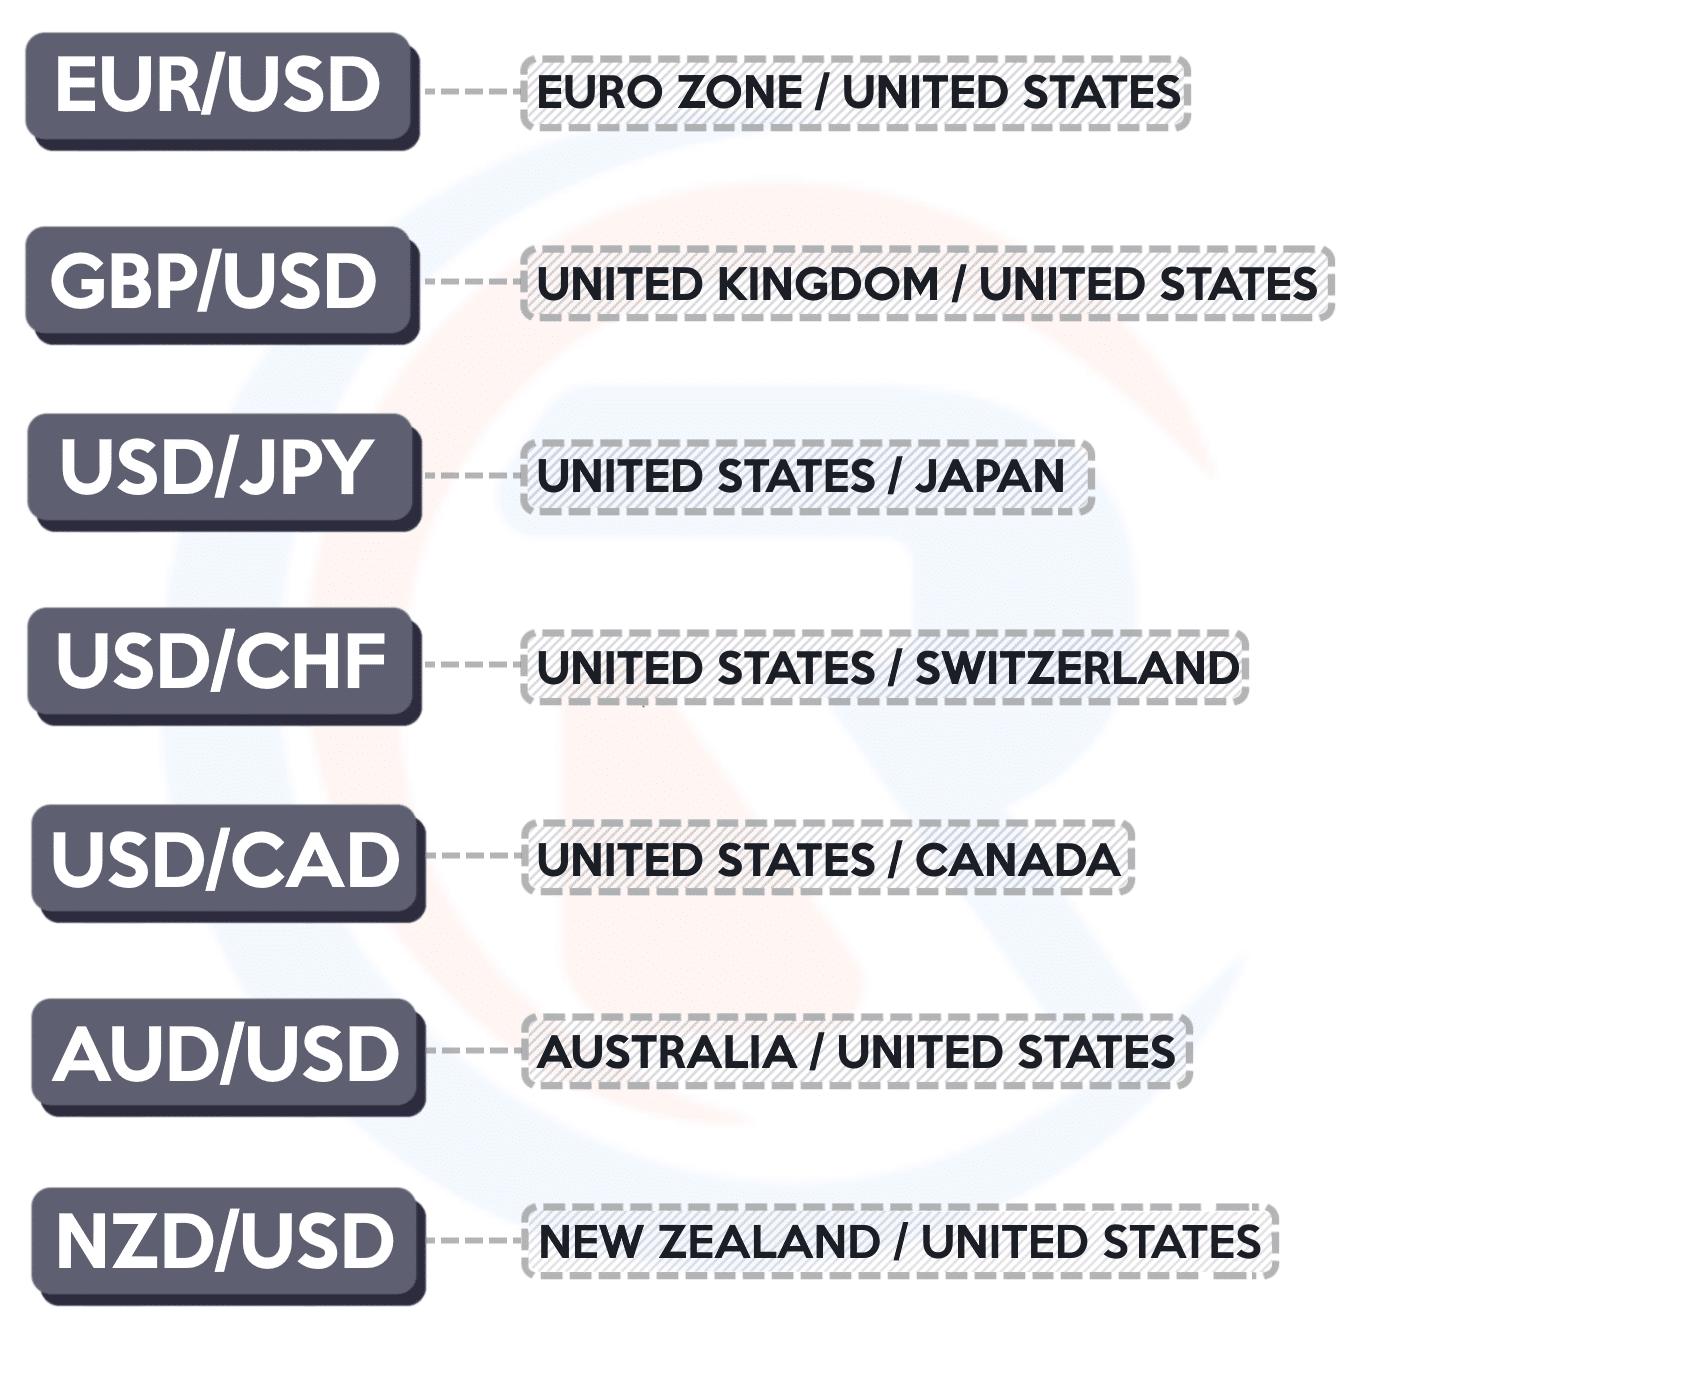 Major currencies forex signaal media vested